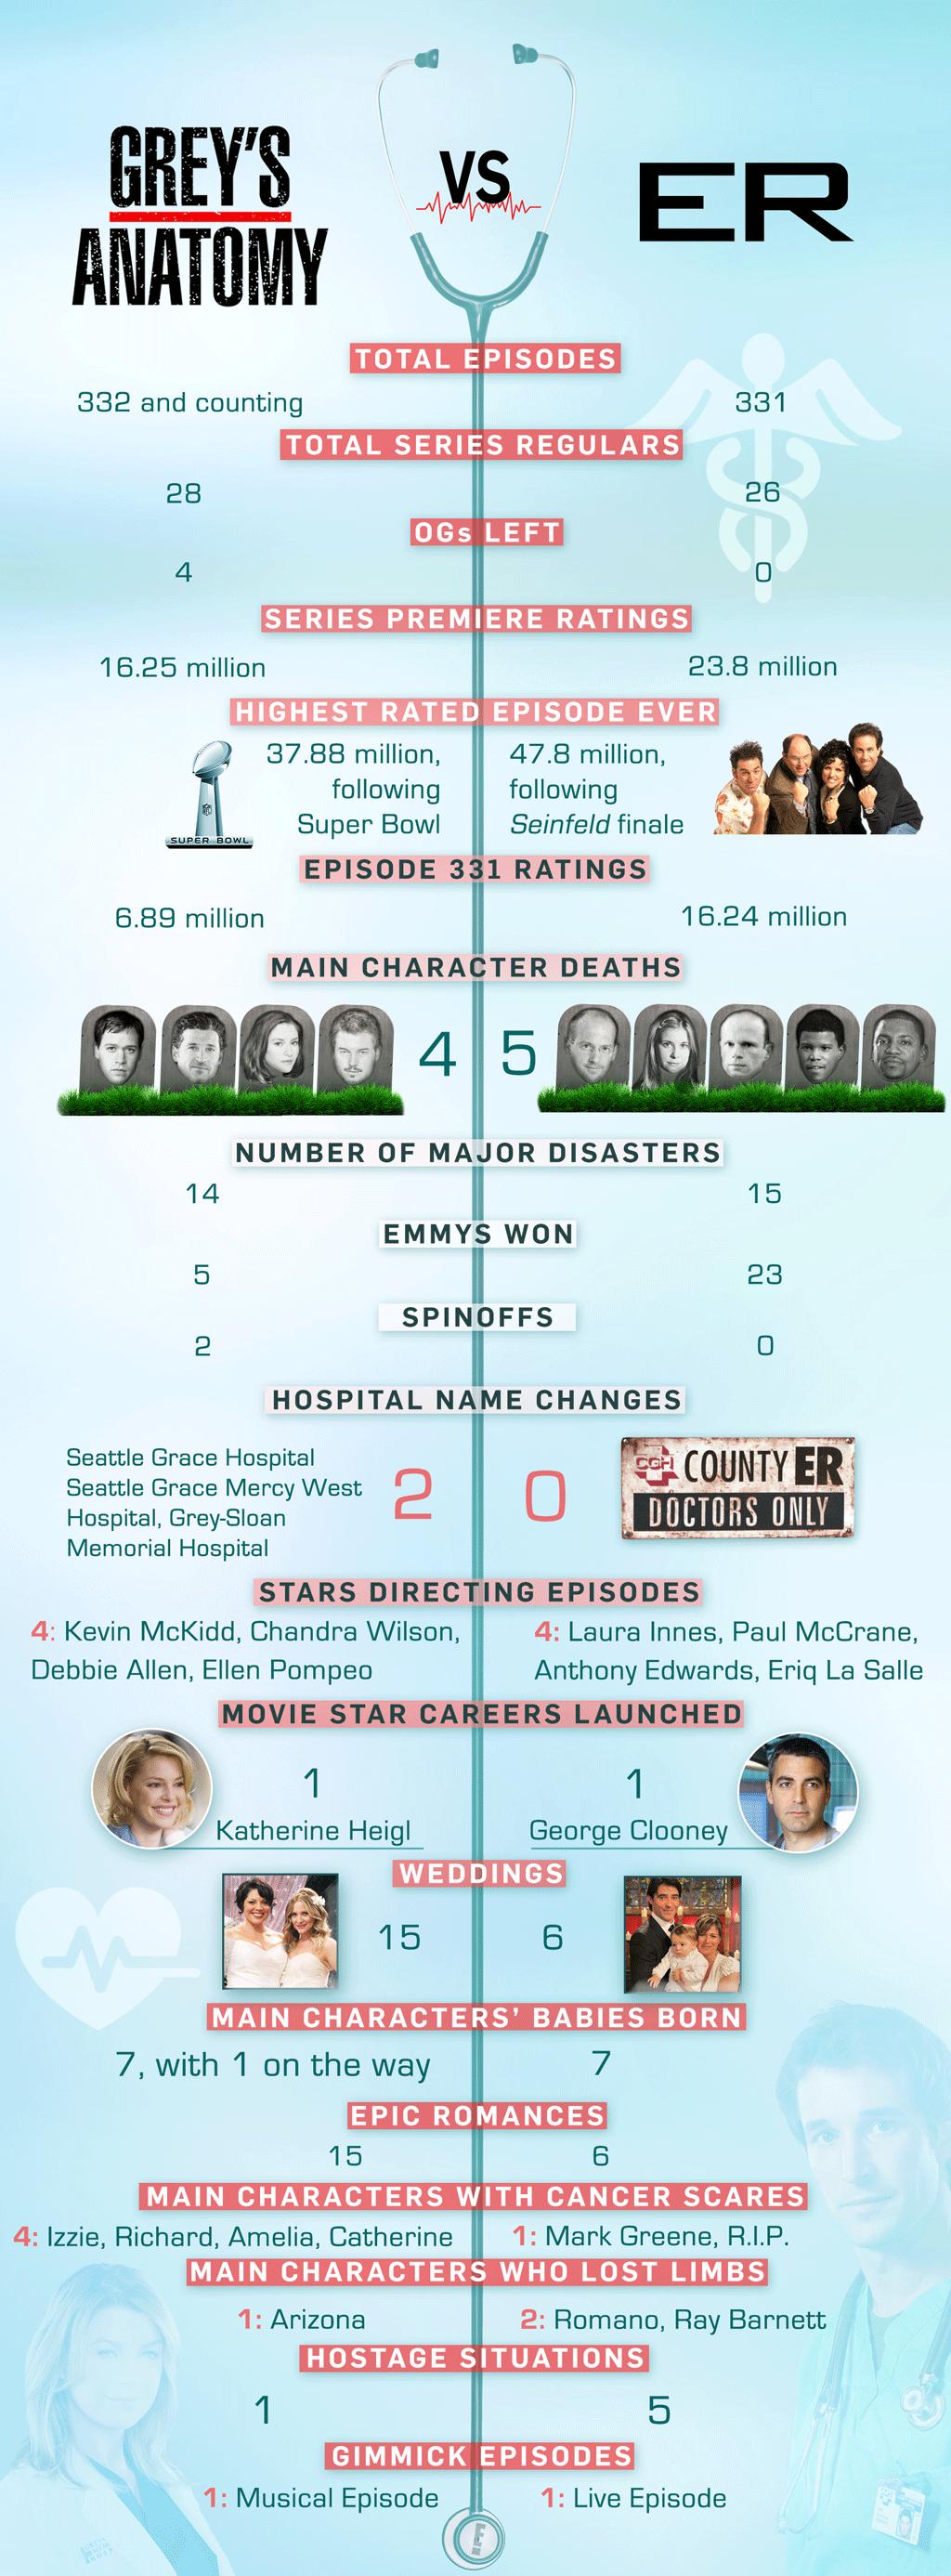 Grey's Anatomy vs ER, Infographic